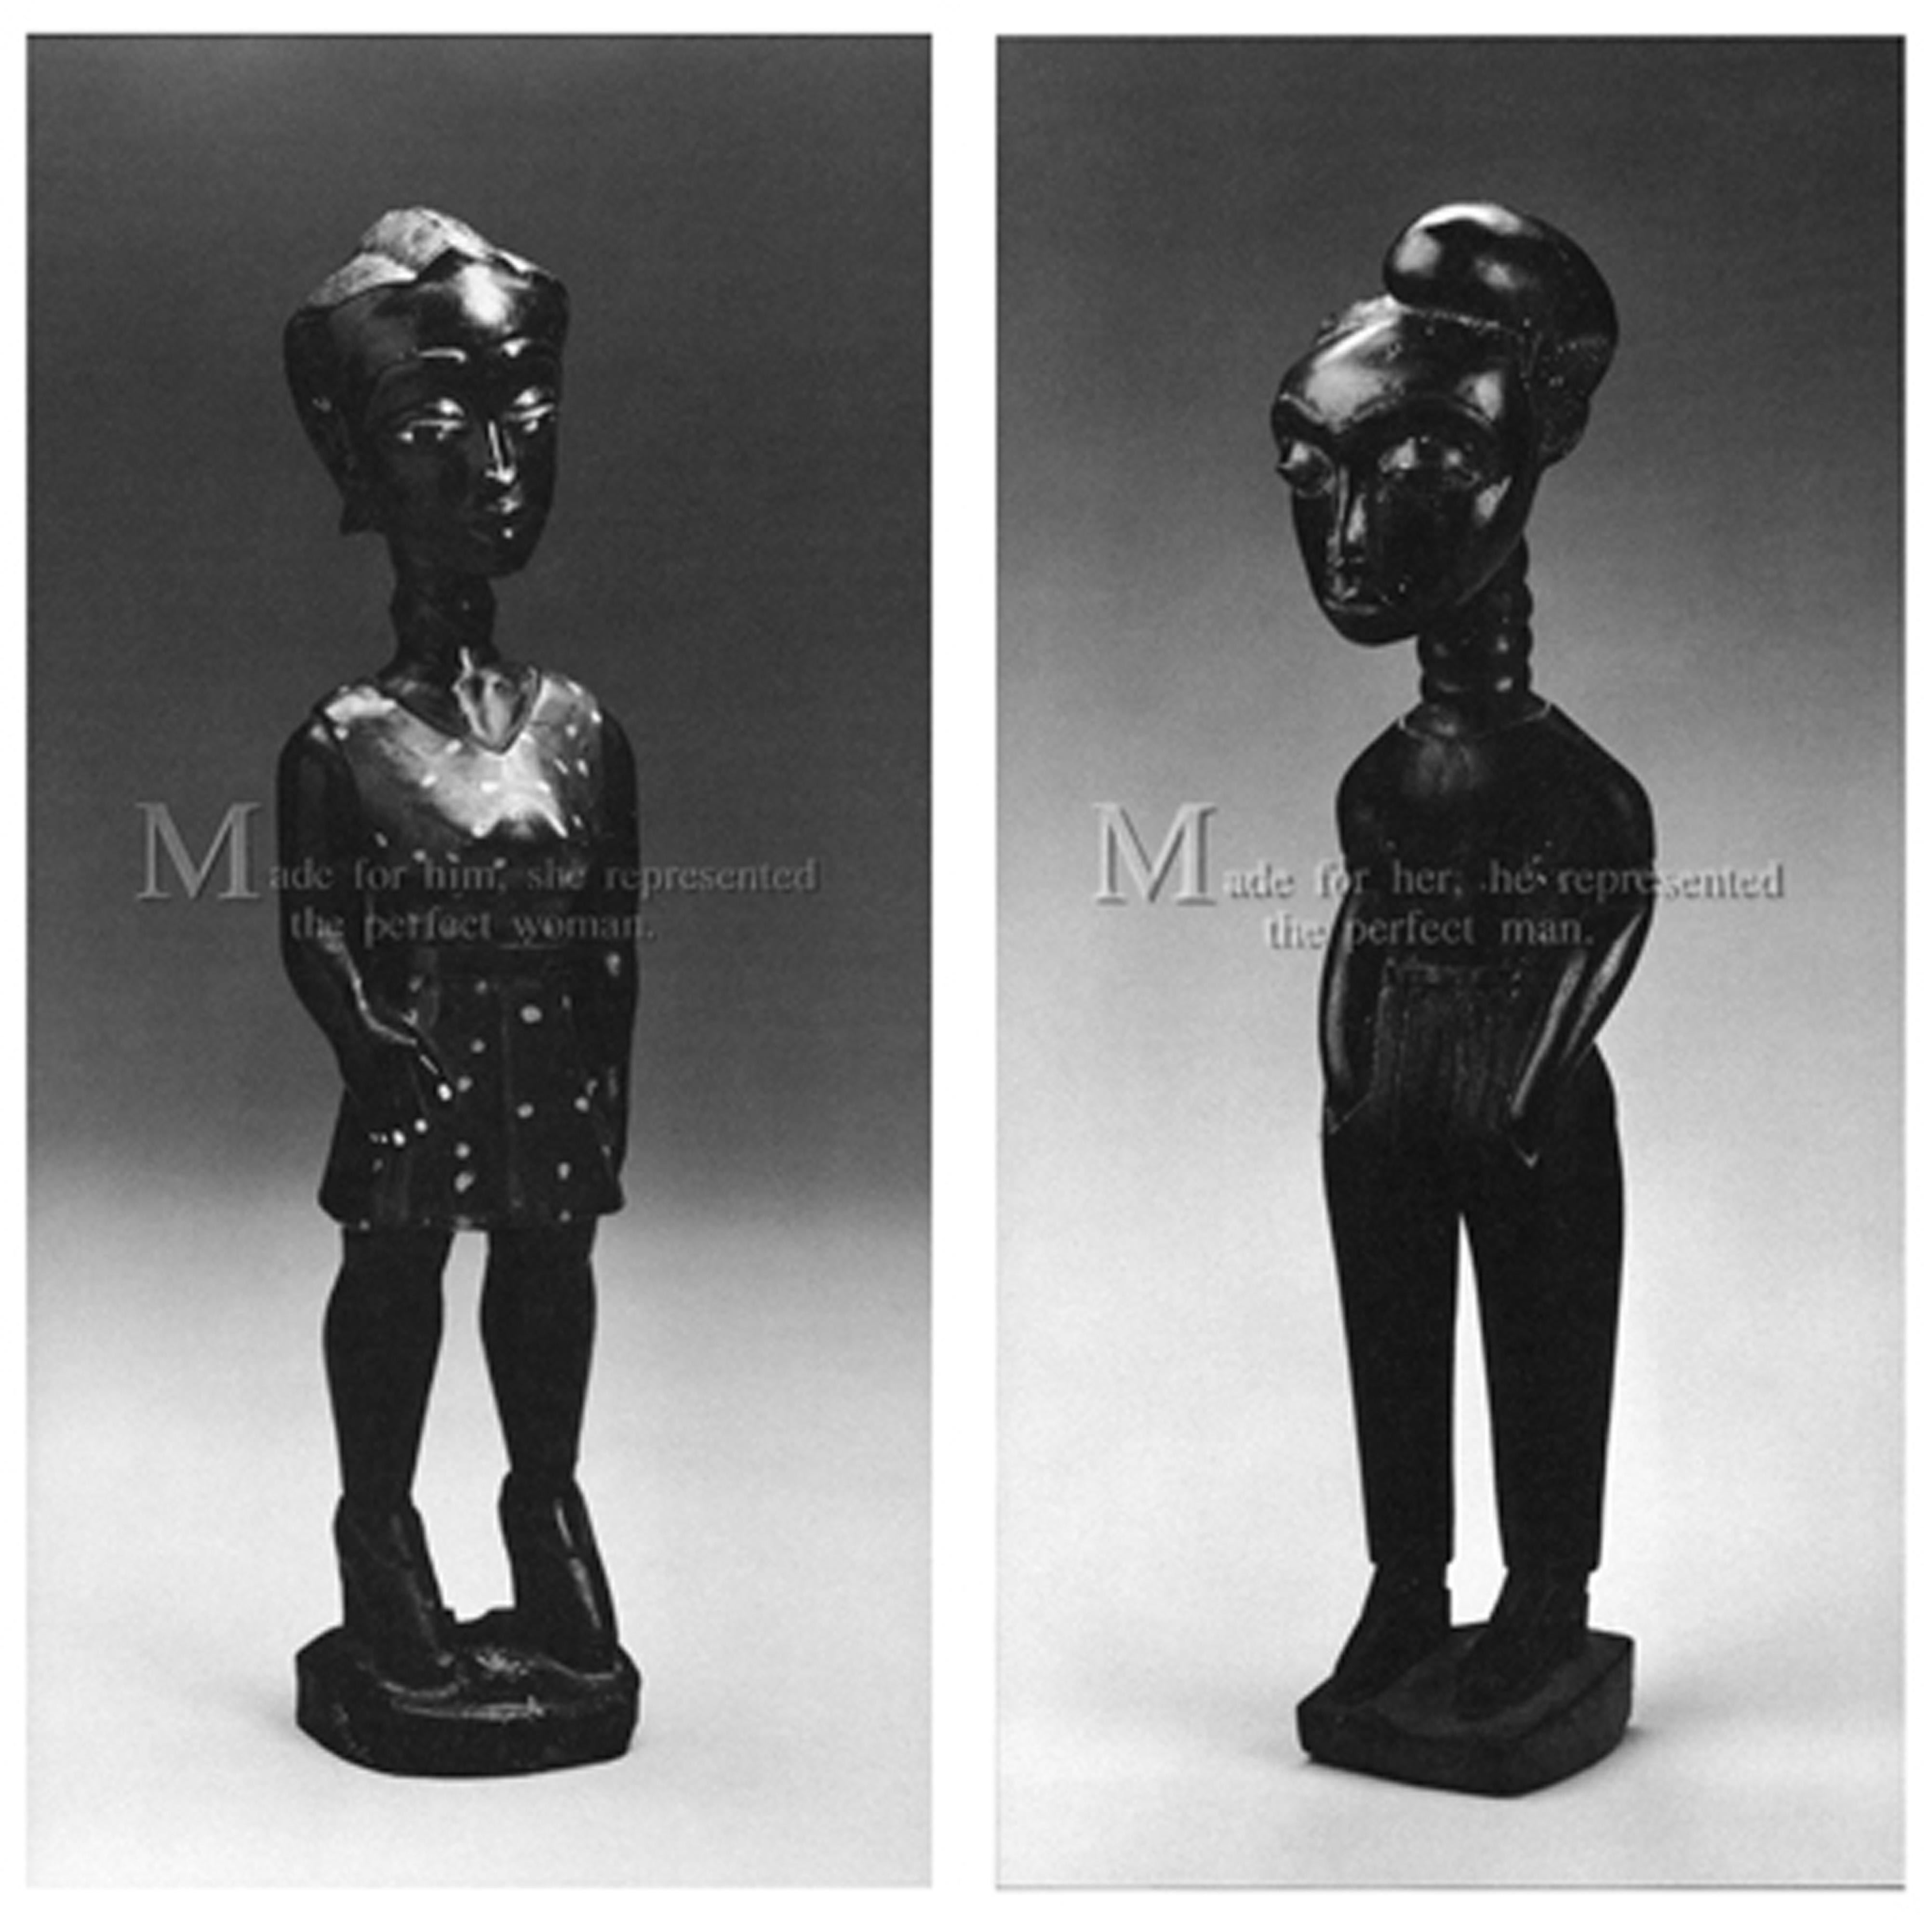 Galerie Barbara Thumm \ Carrie Mae Weems: Made For Him, Made For Her (CMW-93-006) \ Made For Him, Made For Her (1993)